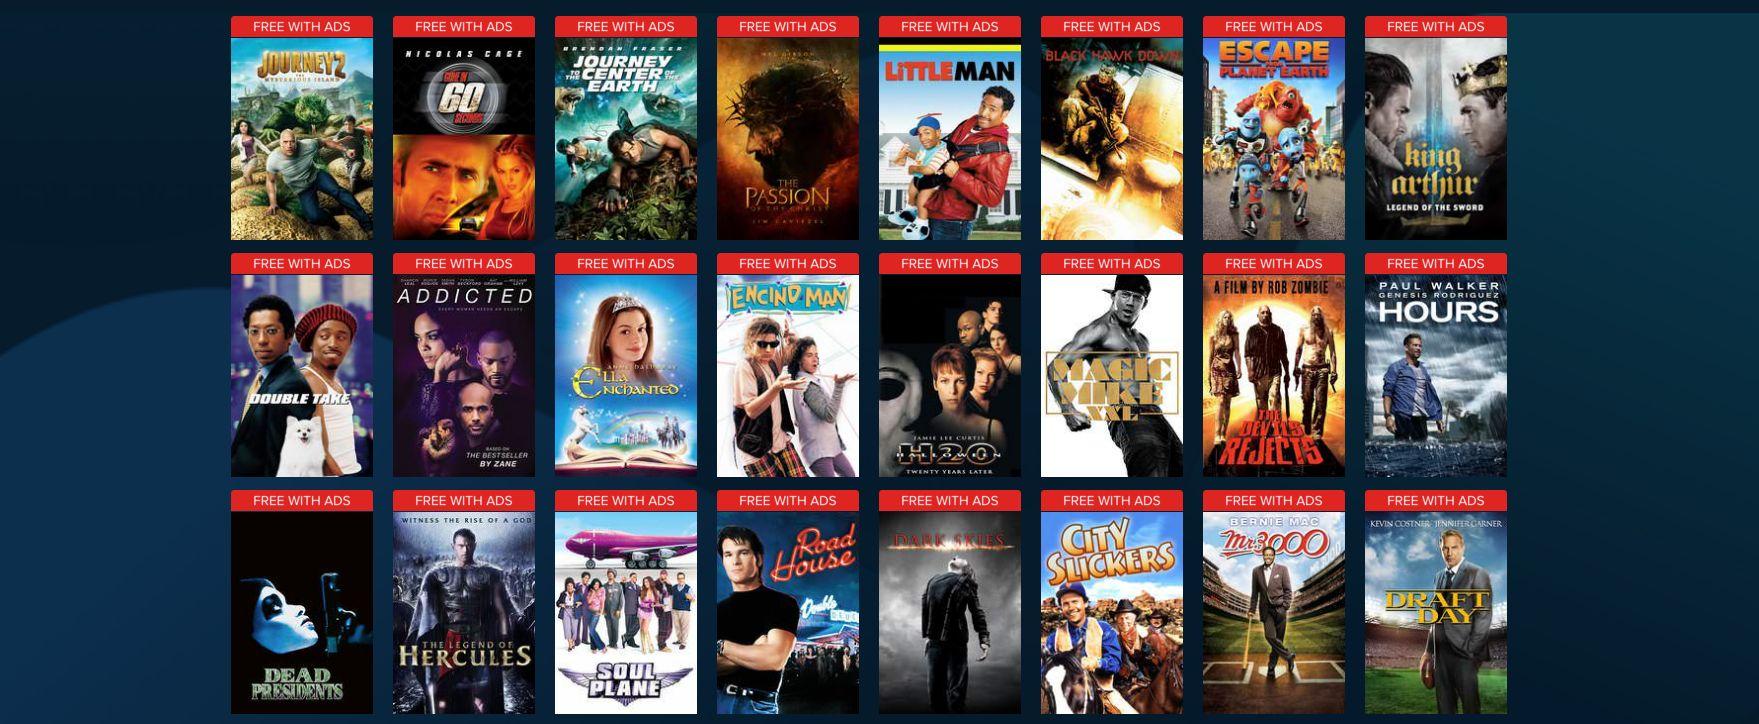 best vudu free movies